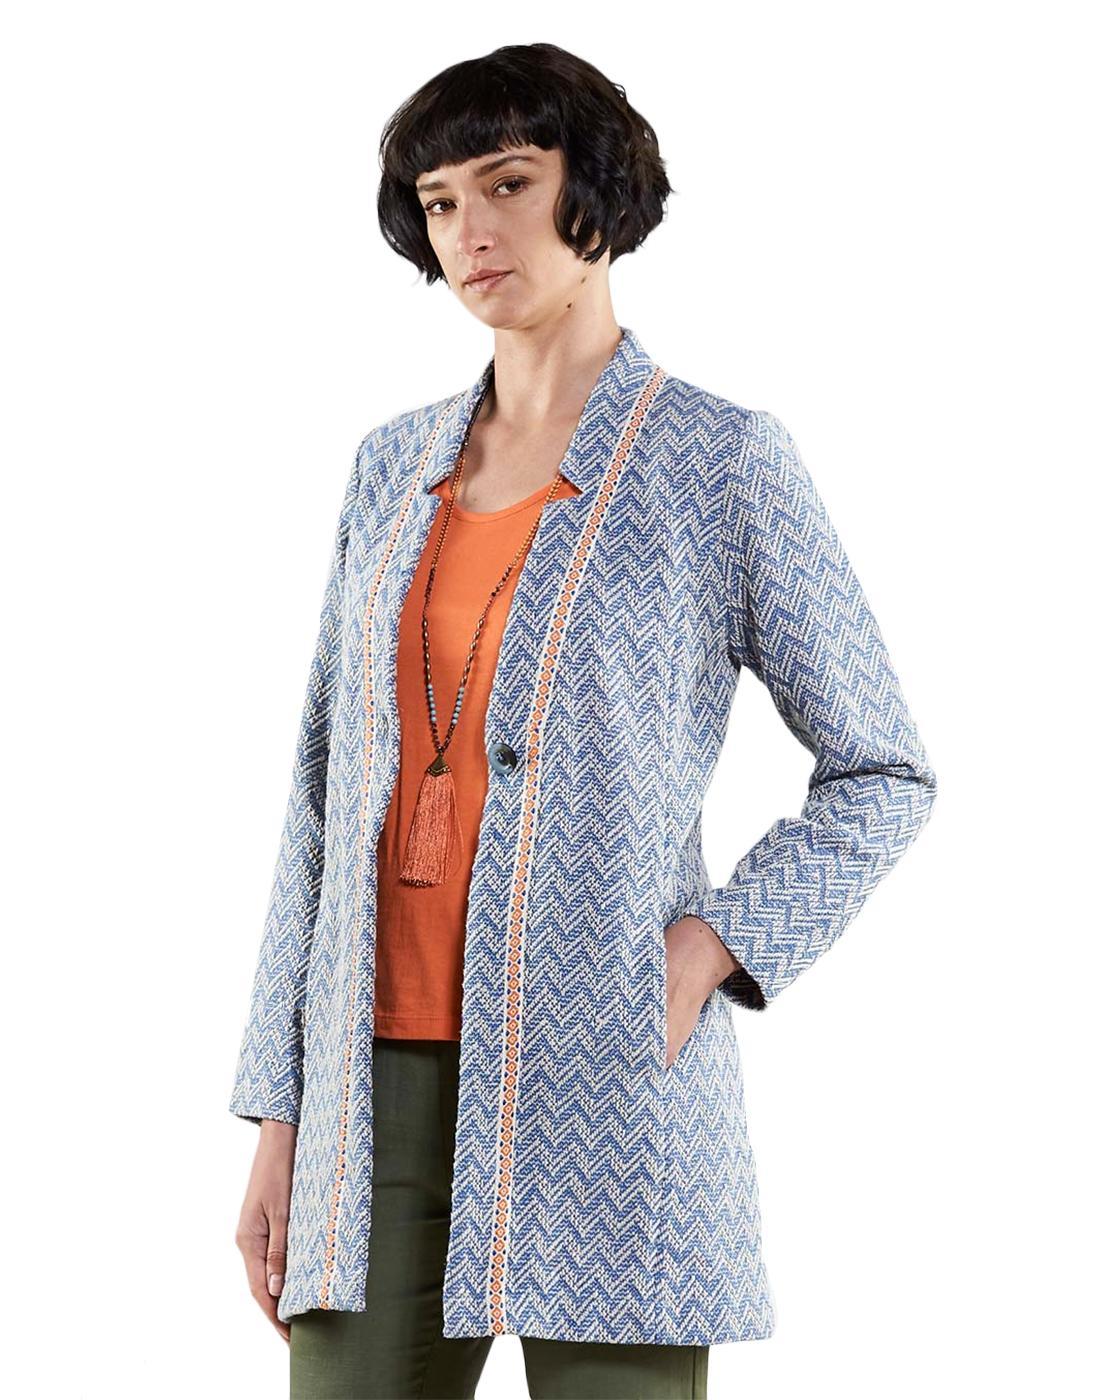 NOMADS Retro 1970's Handloom Woven Summer Jacket